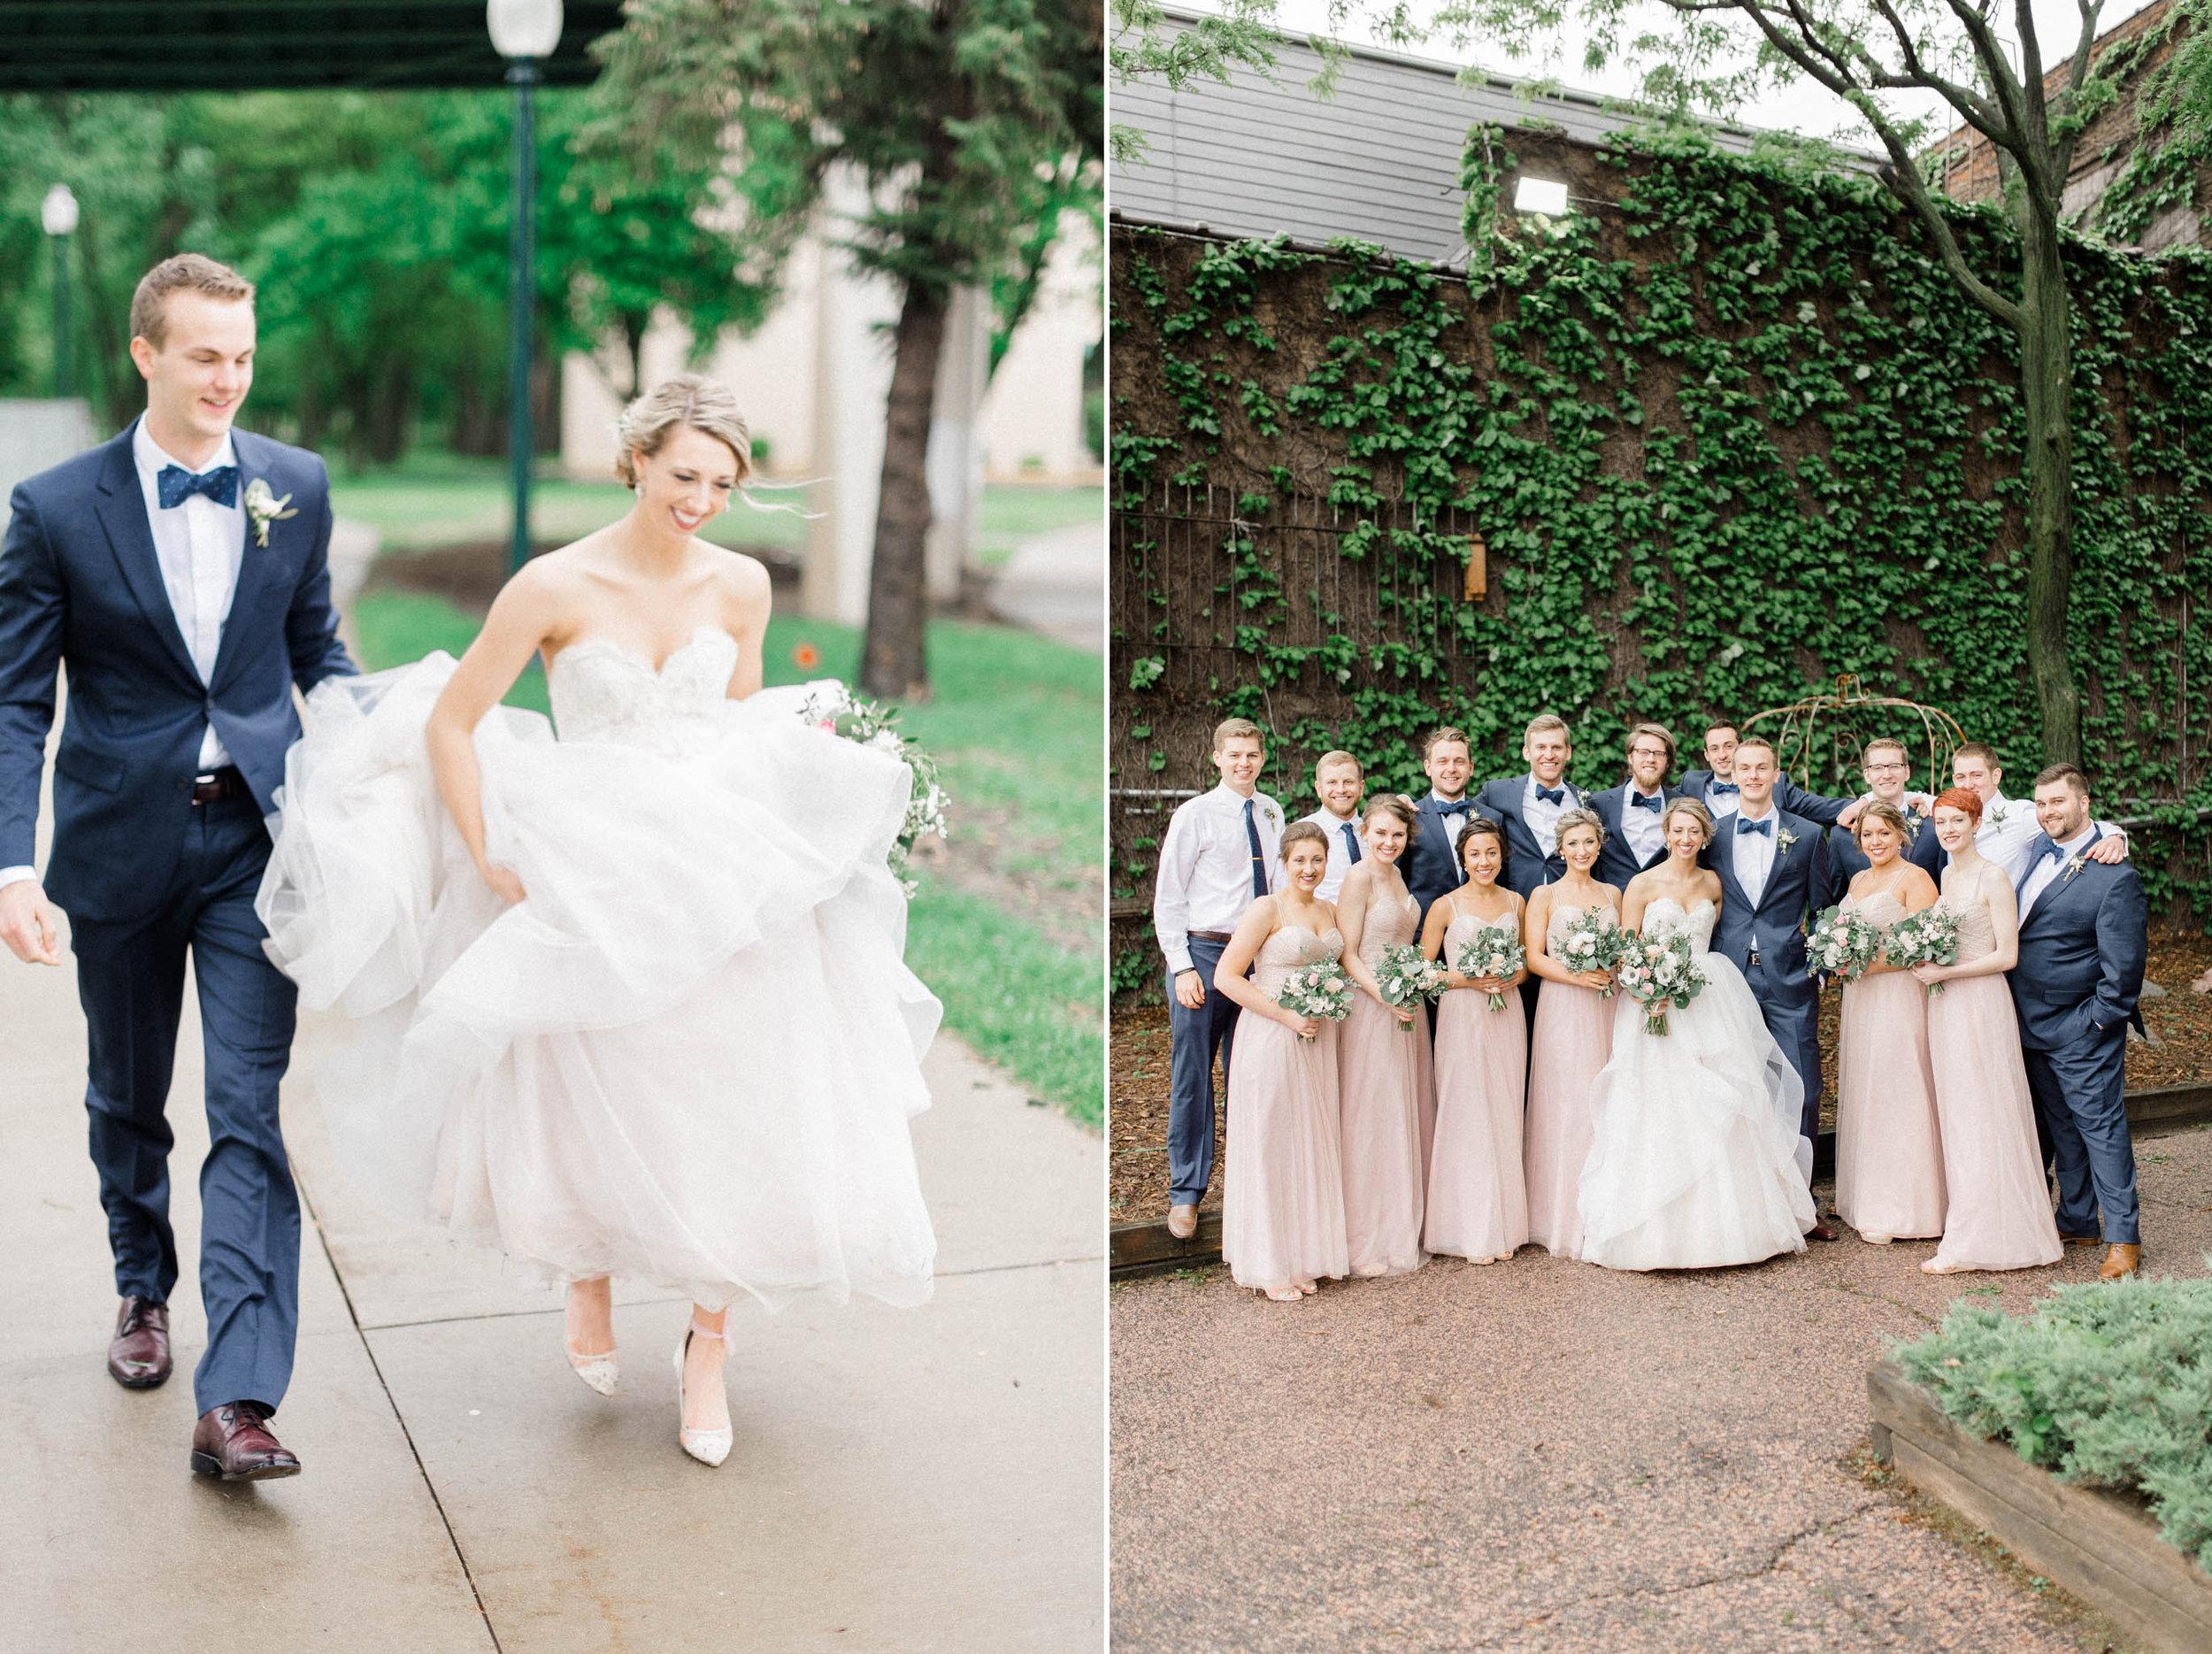 Sarah and Brad Wedding 2up-8.jpg